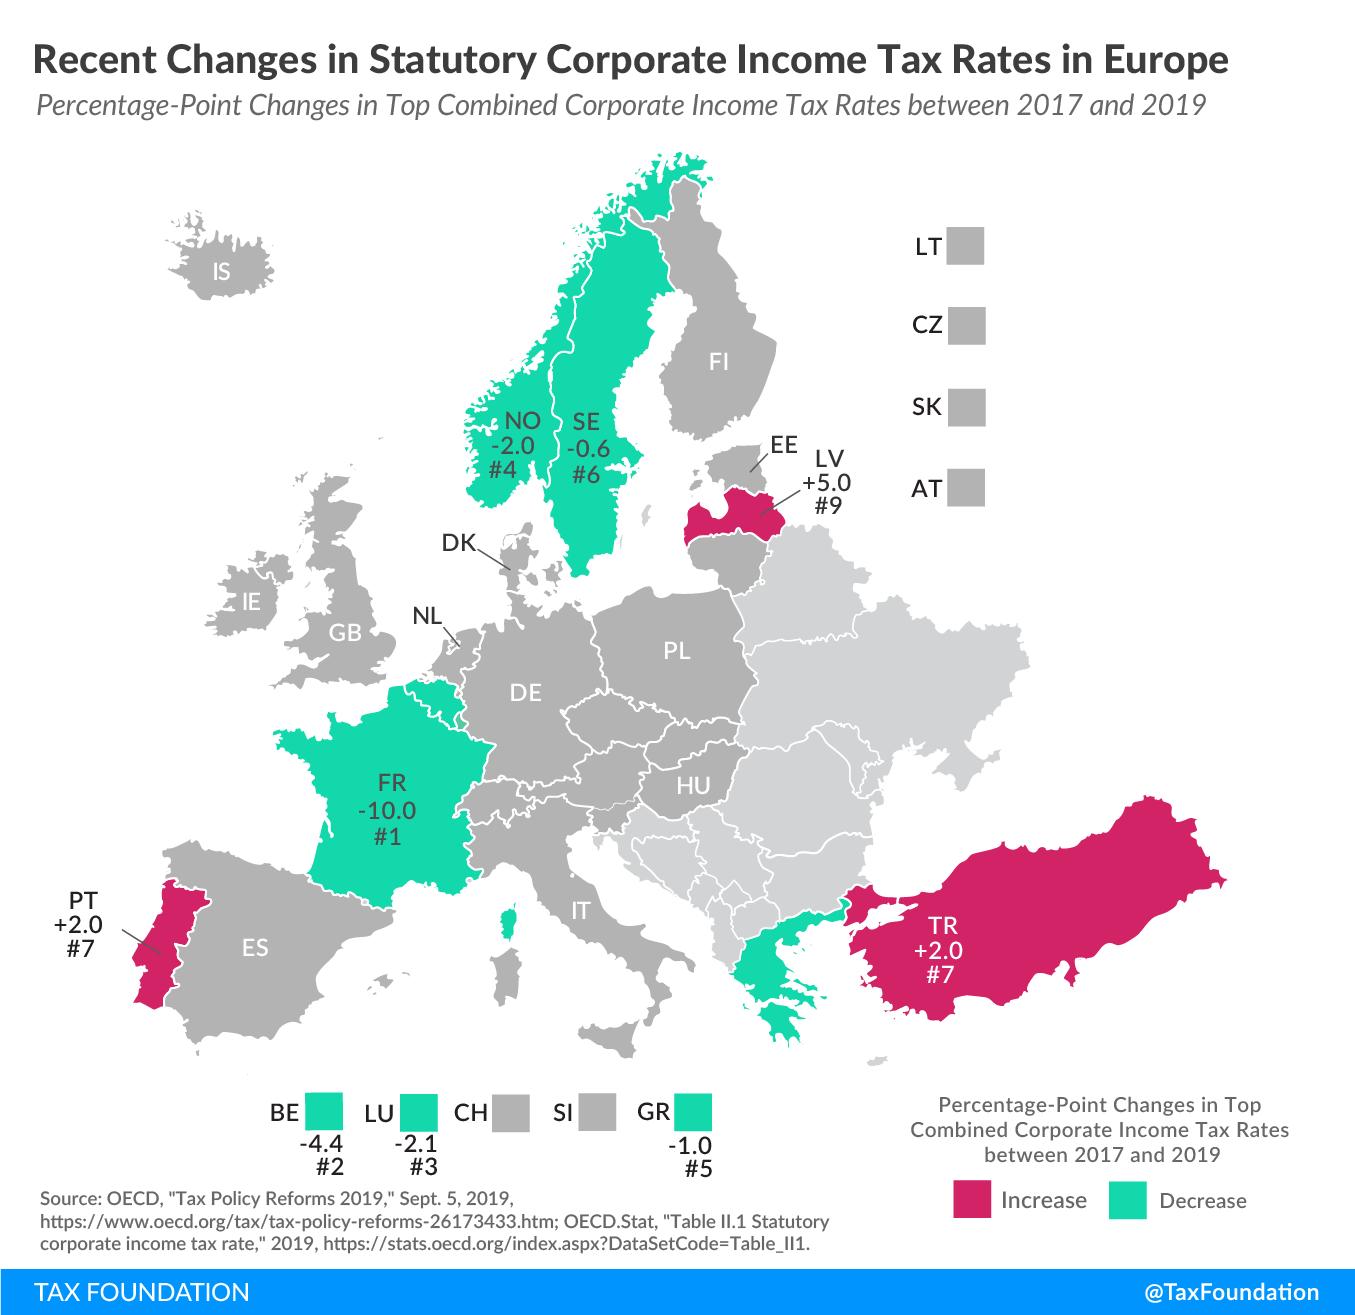 corporate tax trends in Europe, corporate income tax trends europe, corporate tax trends eu corporate tax trends, 2019 eu tax trends